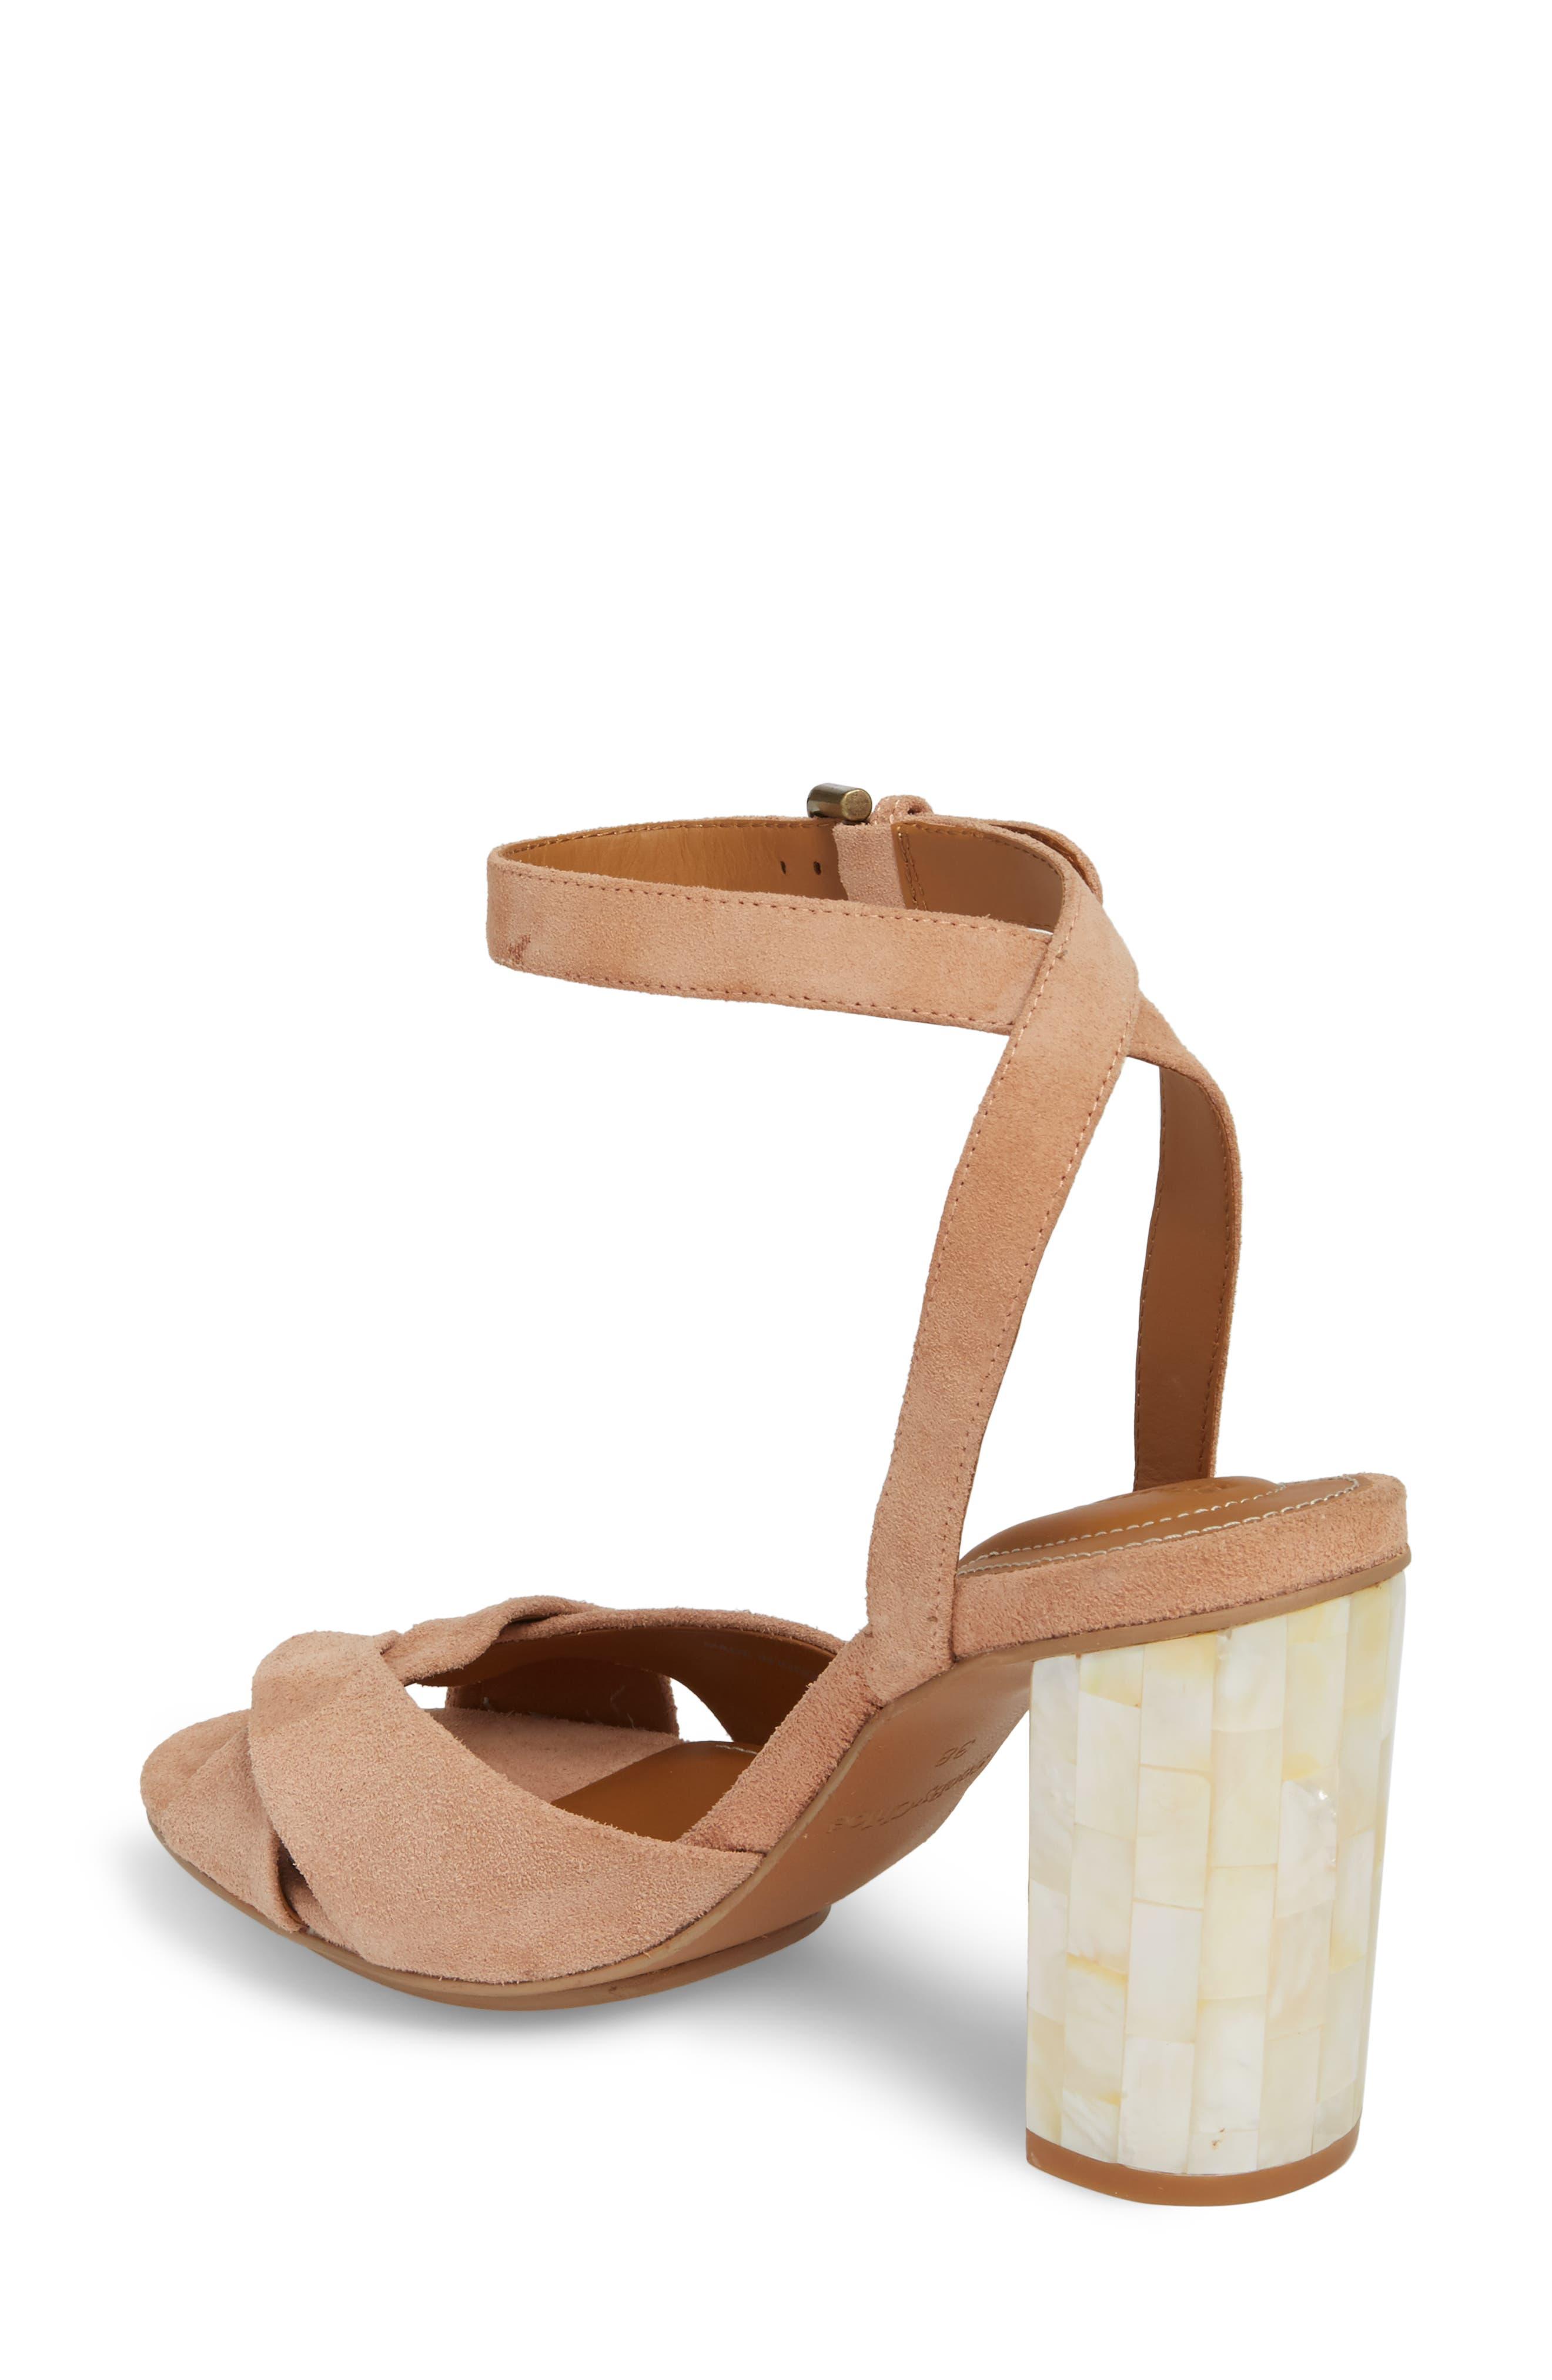 Isida Block Heel Sandal,                             Alternate thumbnail 2, color,                             210